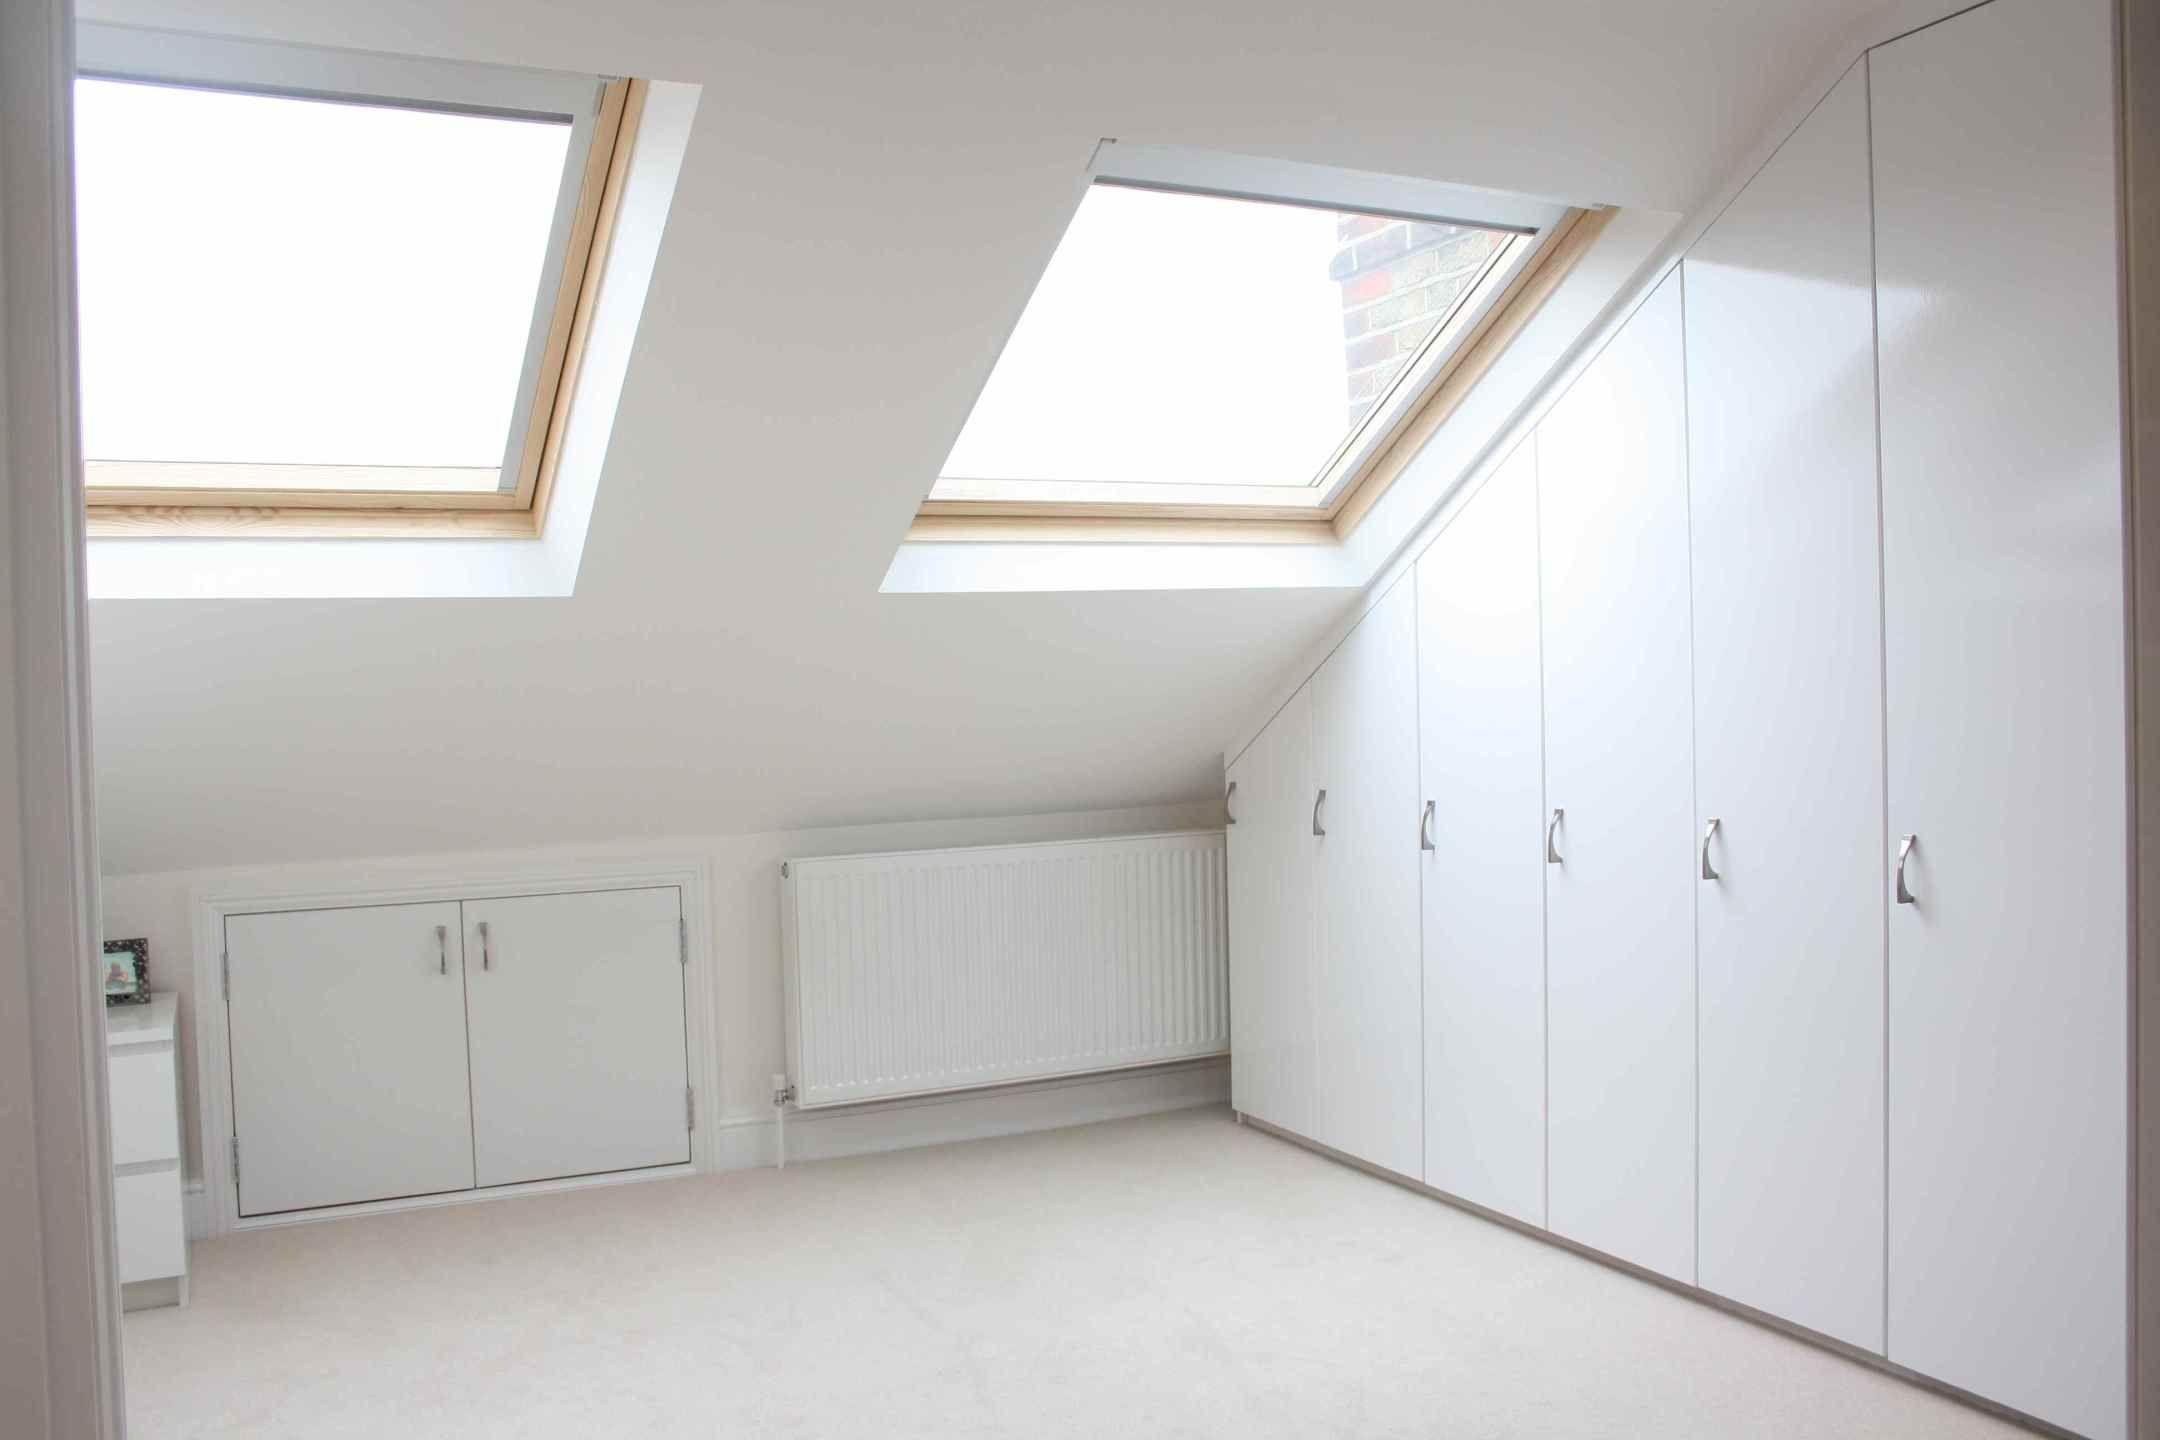 Attic Storage Ideas Pinterest Small Loft Bedroom Loft Storage